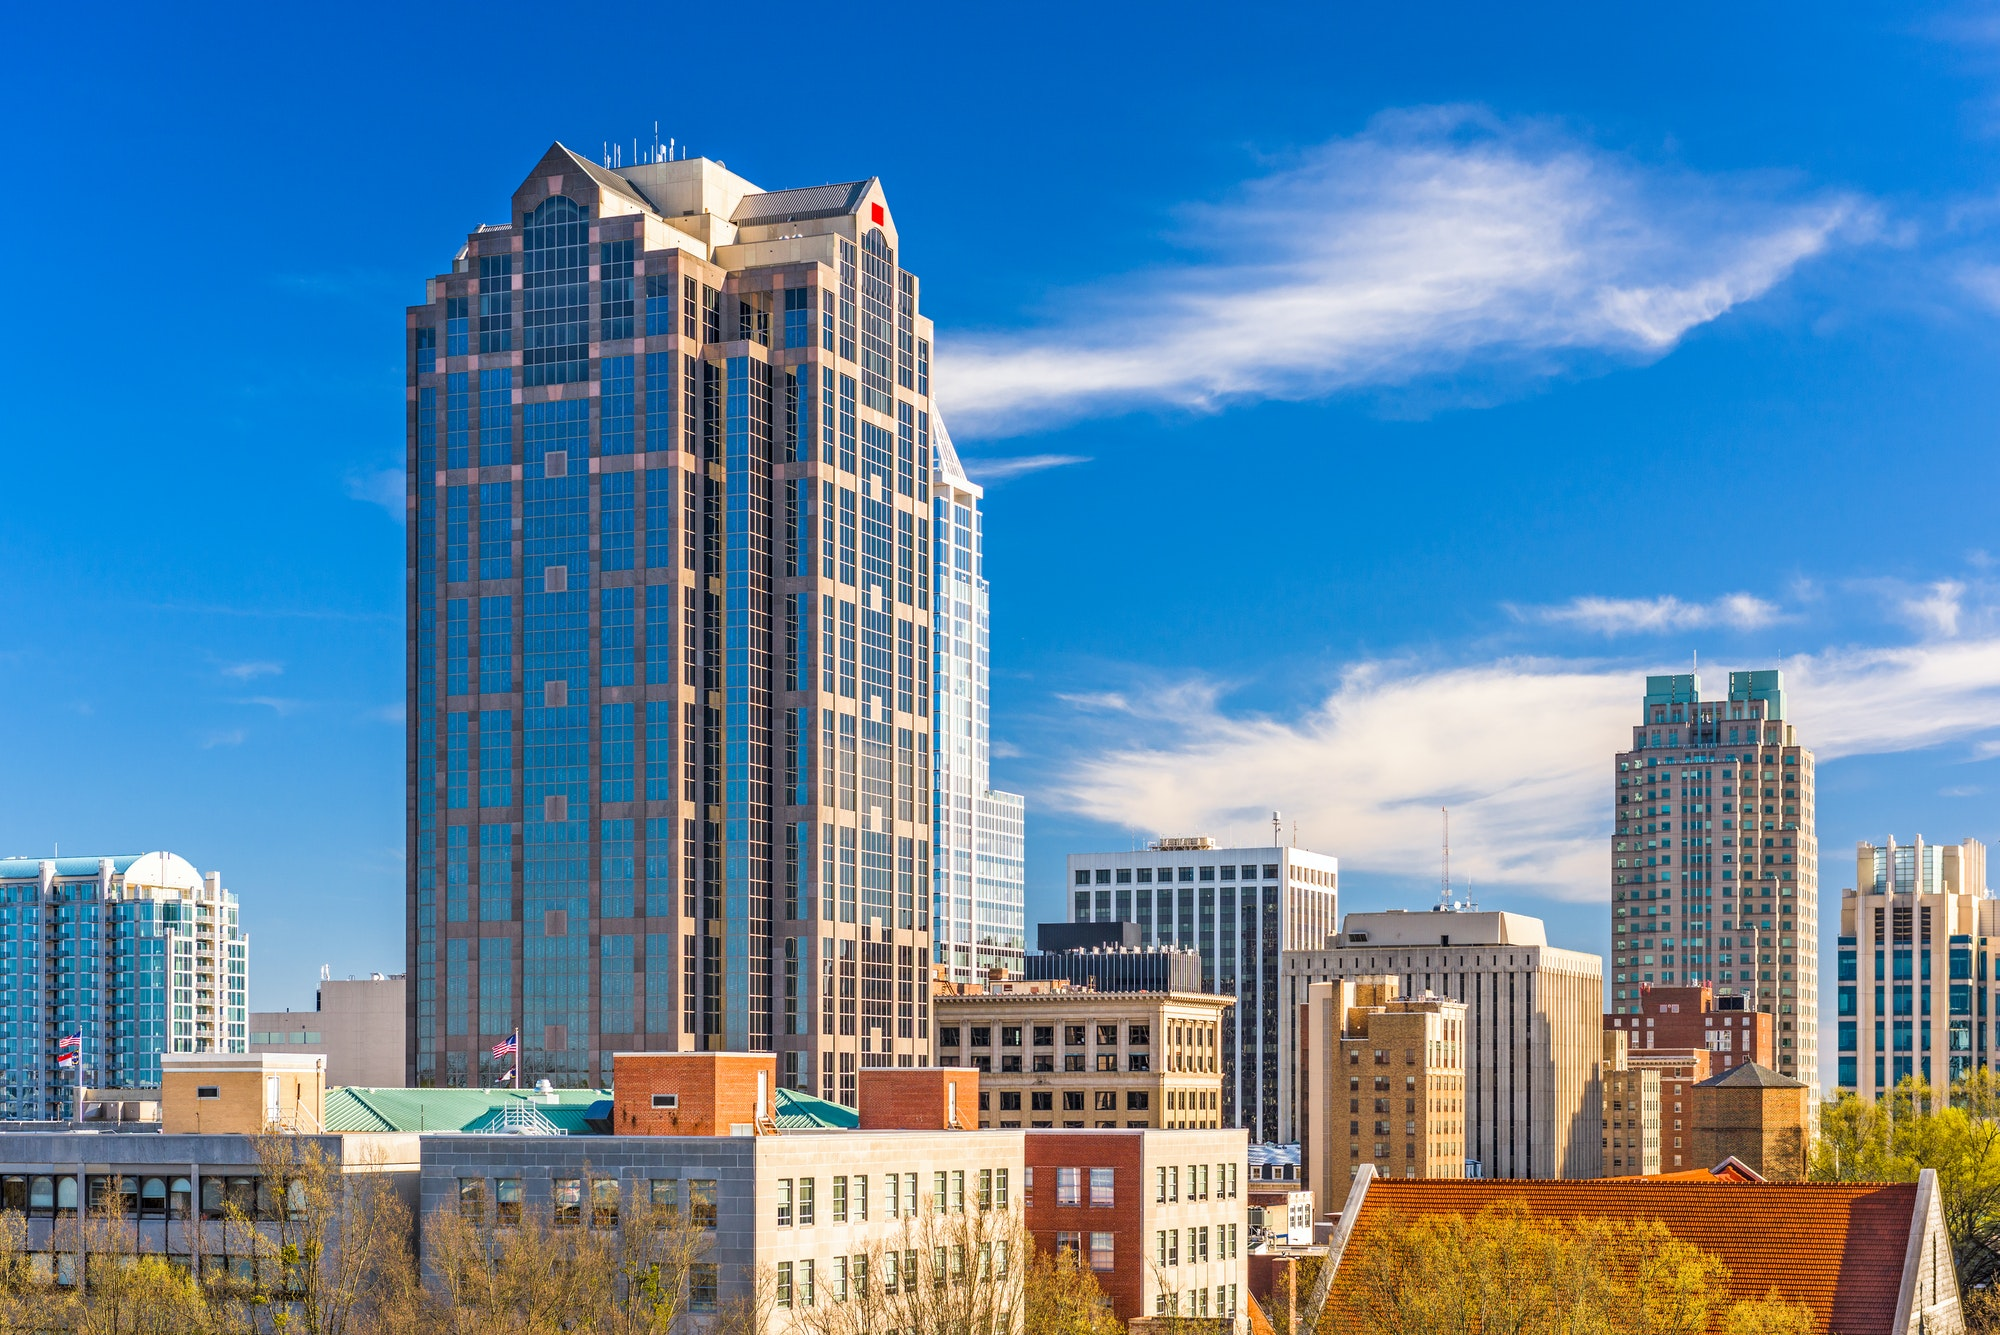 Raleigh, North Carolina, USA